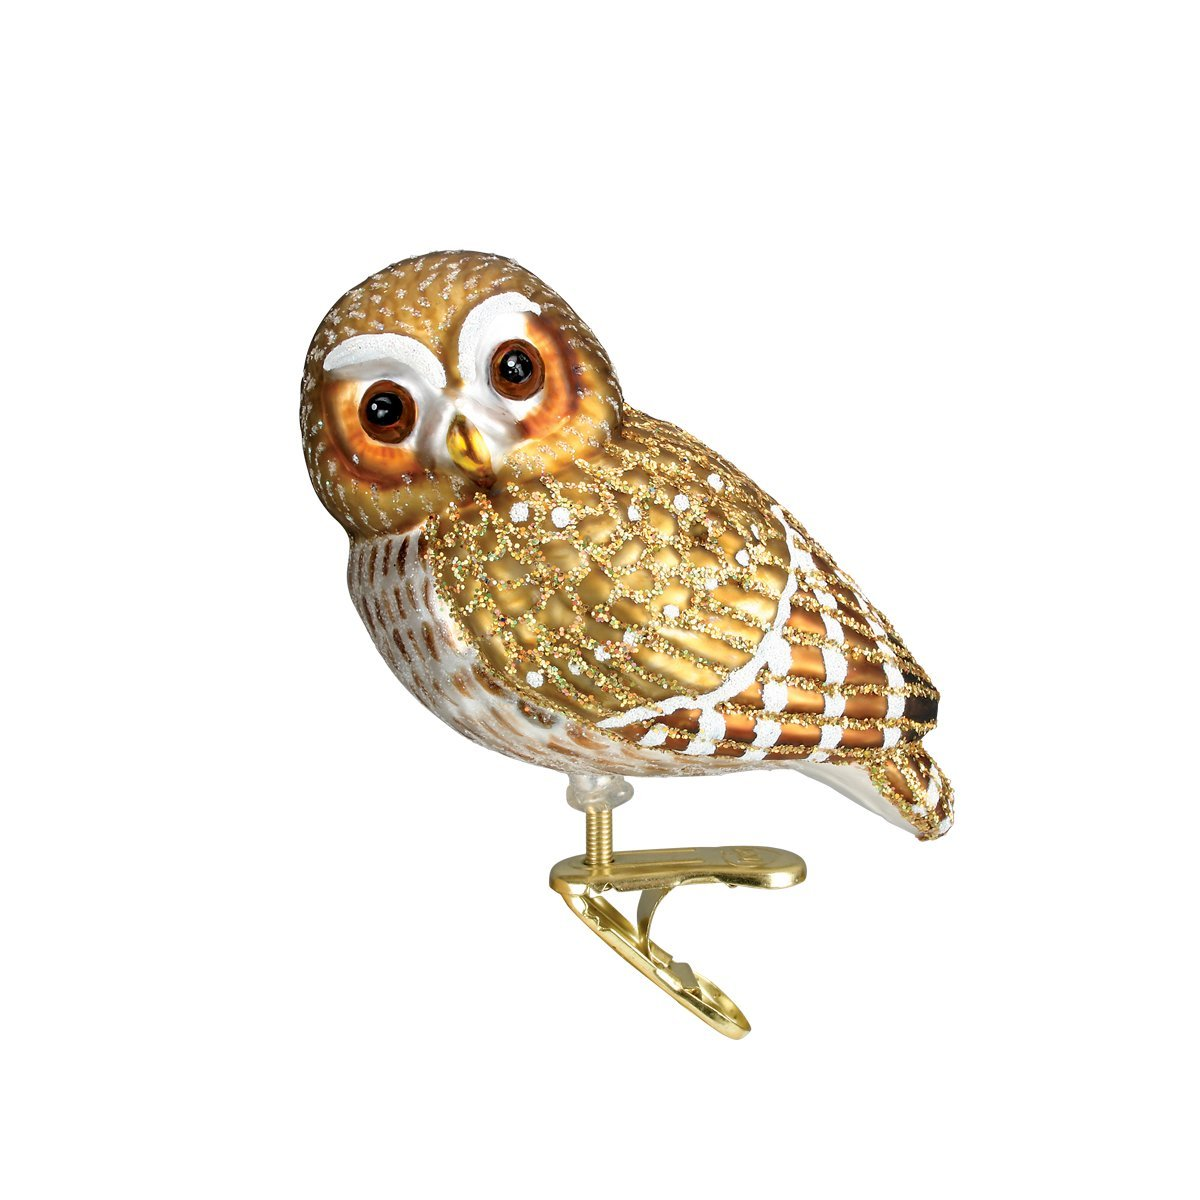 Amazoncom Old World Christmas Ornaments Pygmy Owl Glass Blown